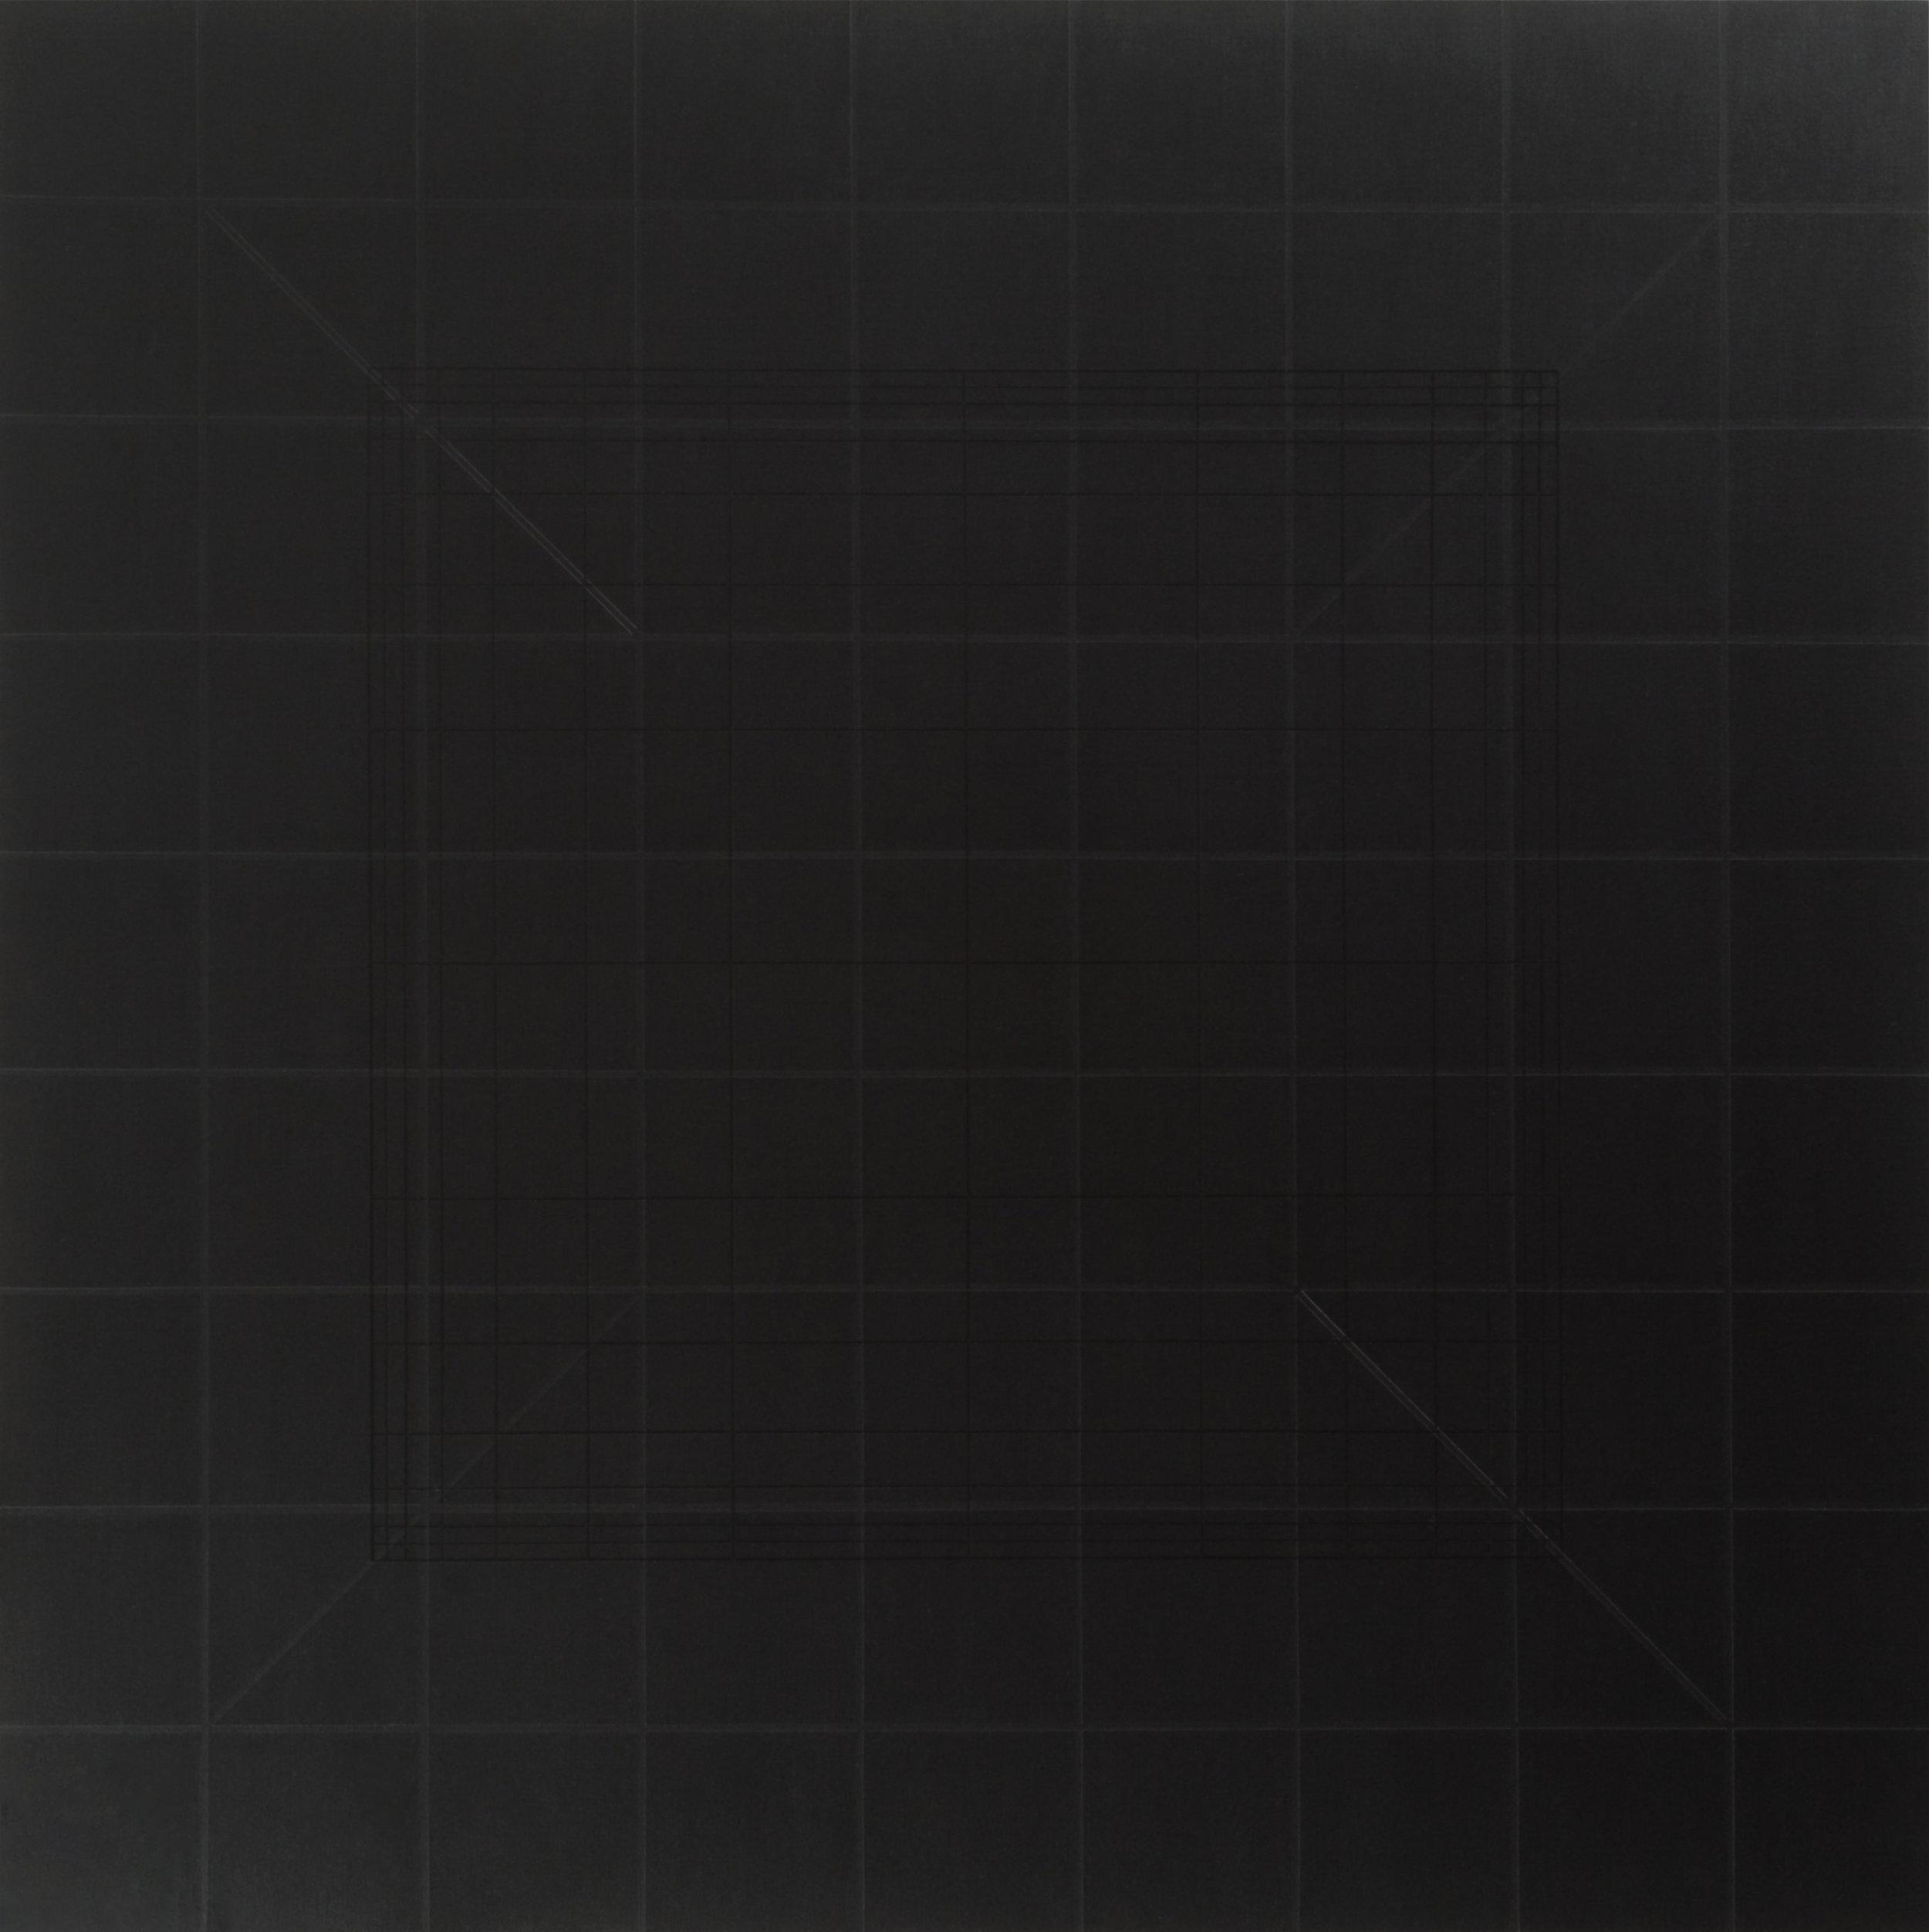 Yantra-ipsum-arkhē(2)2011.Feb, acrylic on canvas, 35 7/16 x 35 7/16 in. [90x90cm]